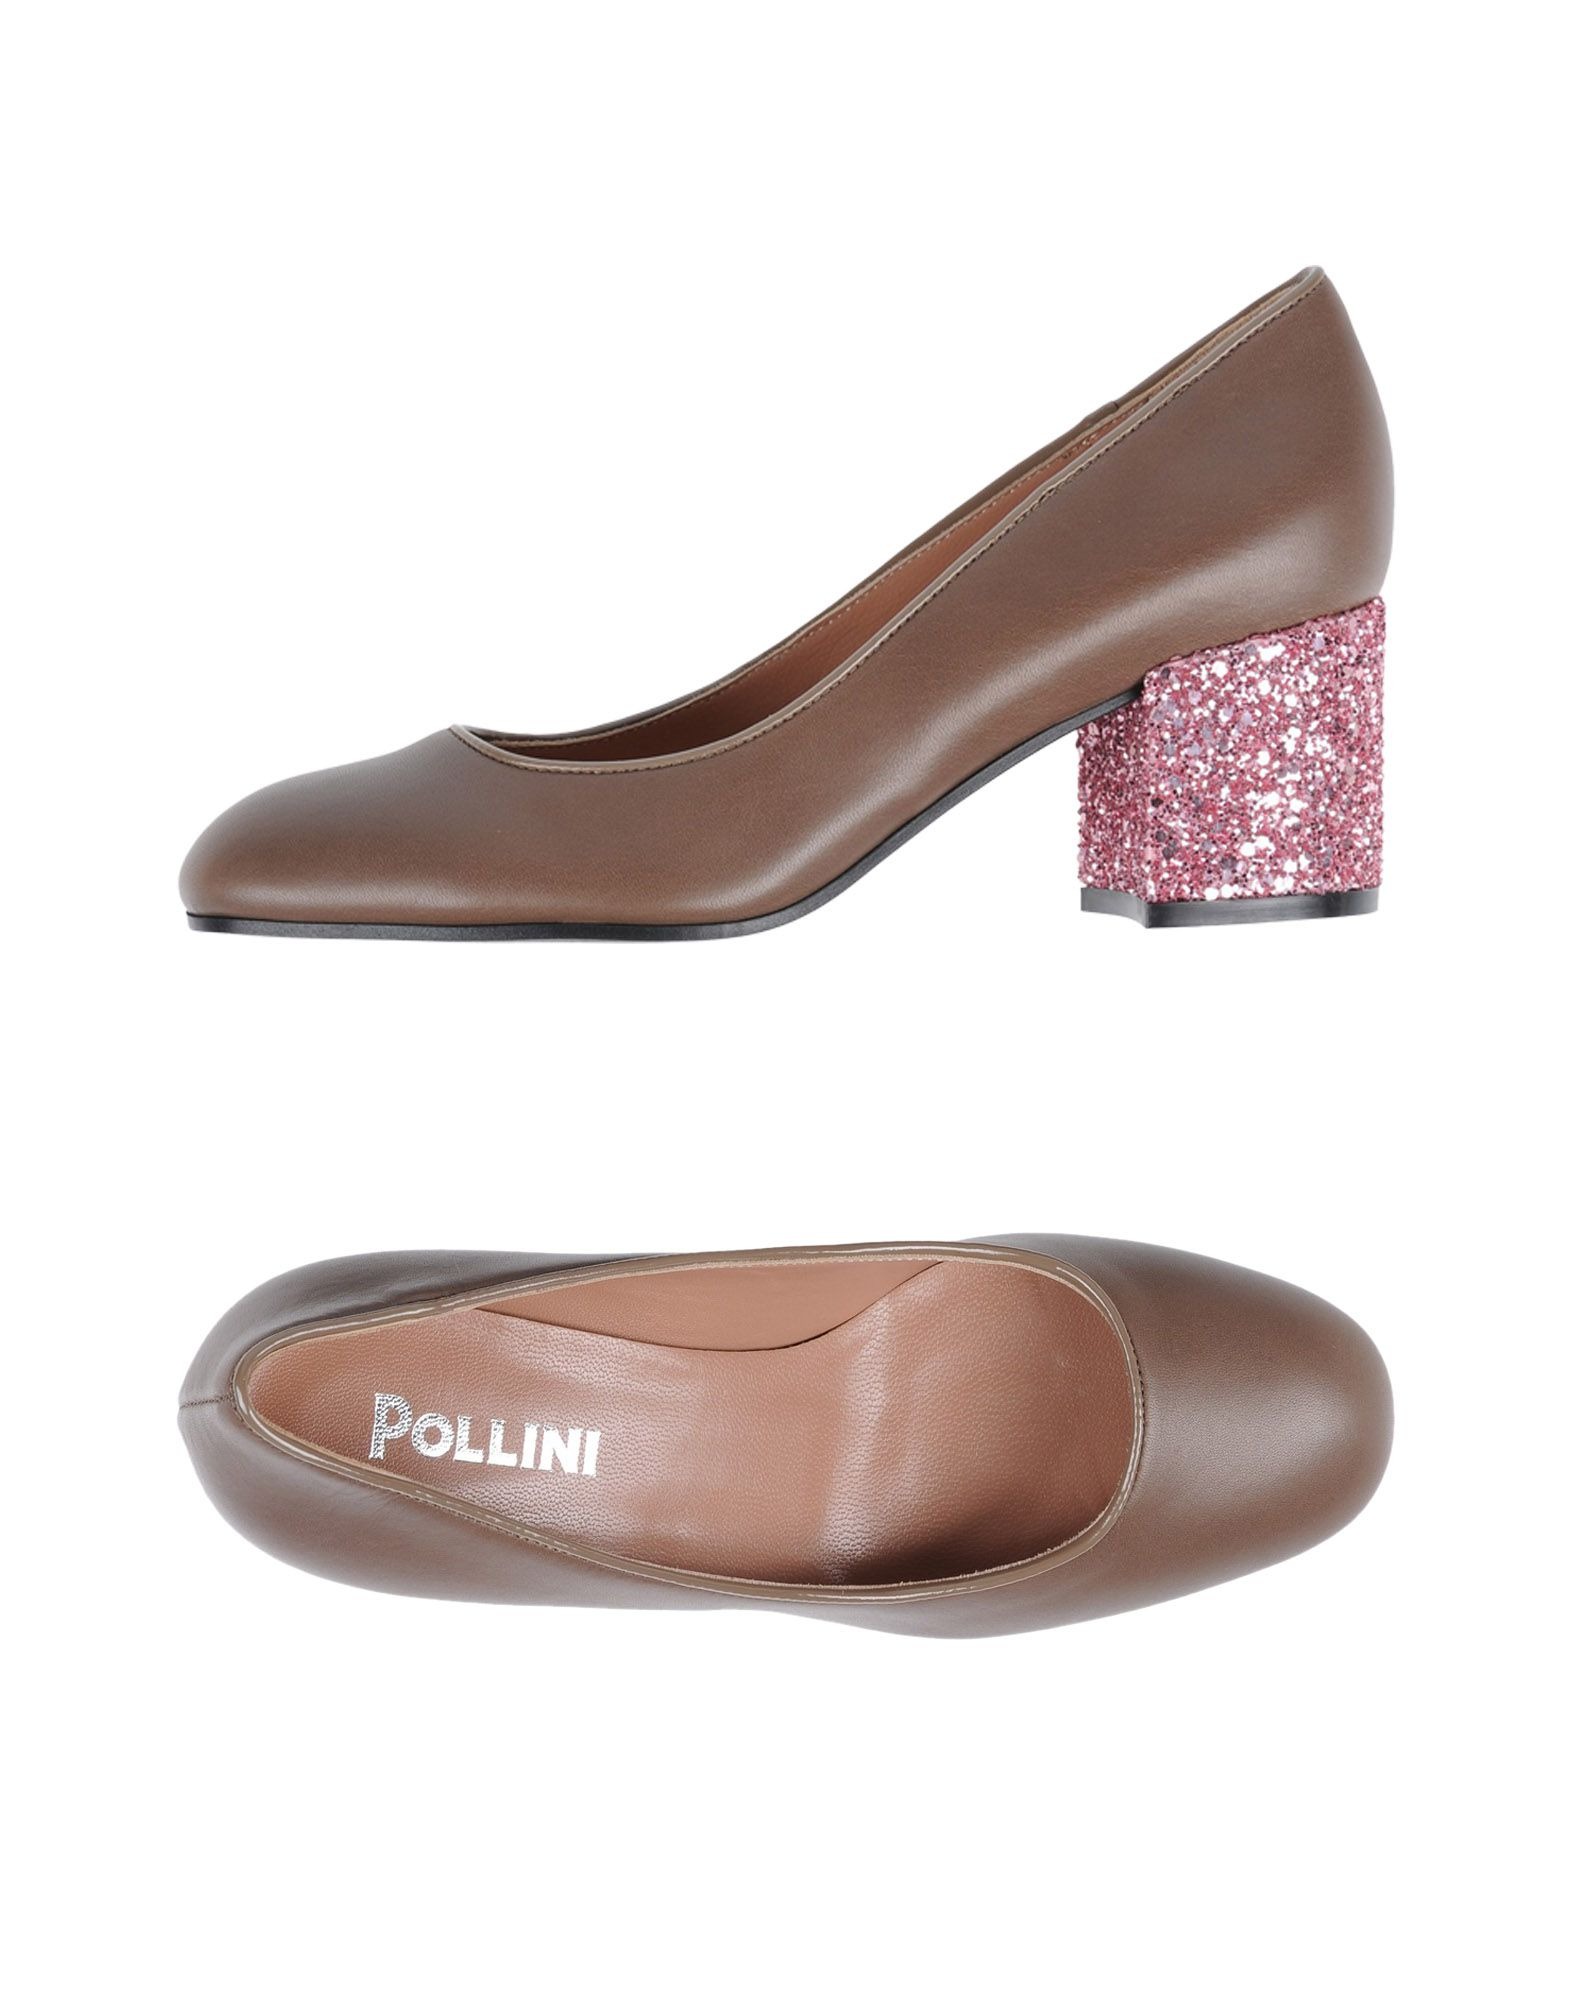 Escarpins Pollini Femme - Escarpins Pollini sur